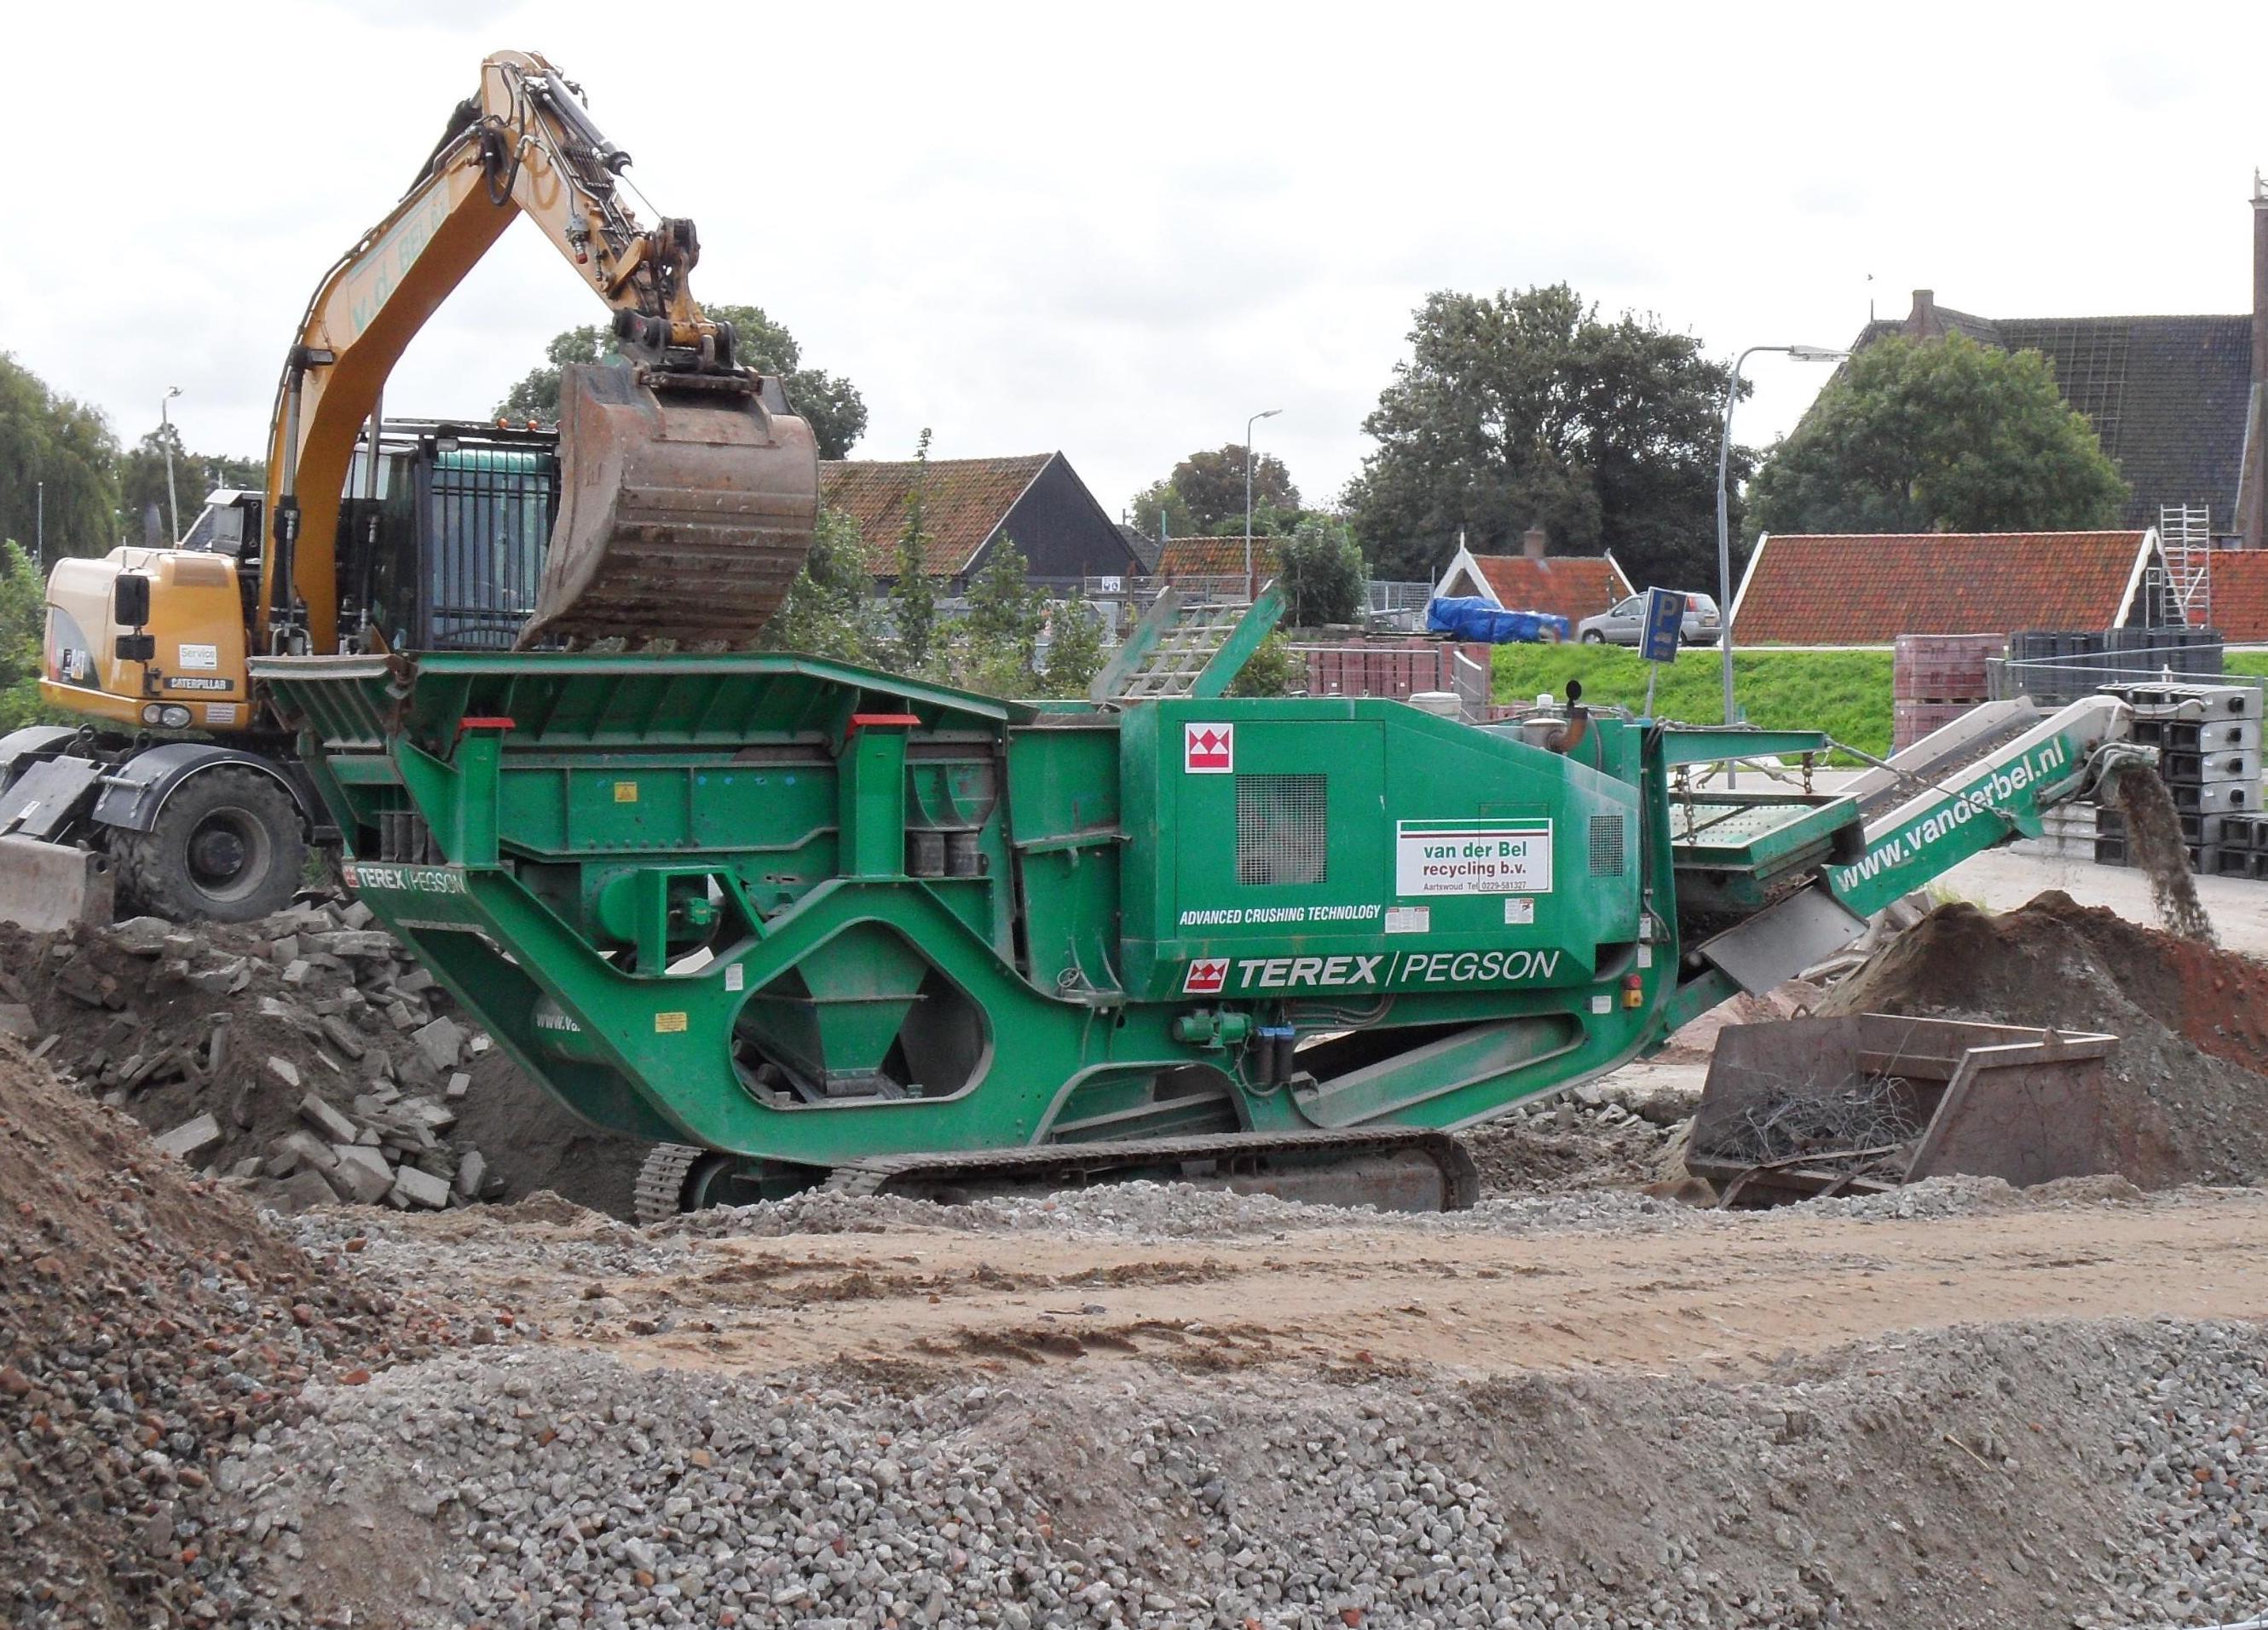 'Stop gebruik menggranulaat, Leiden heeft al genoeg plasticvervuiling'